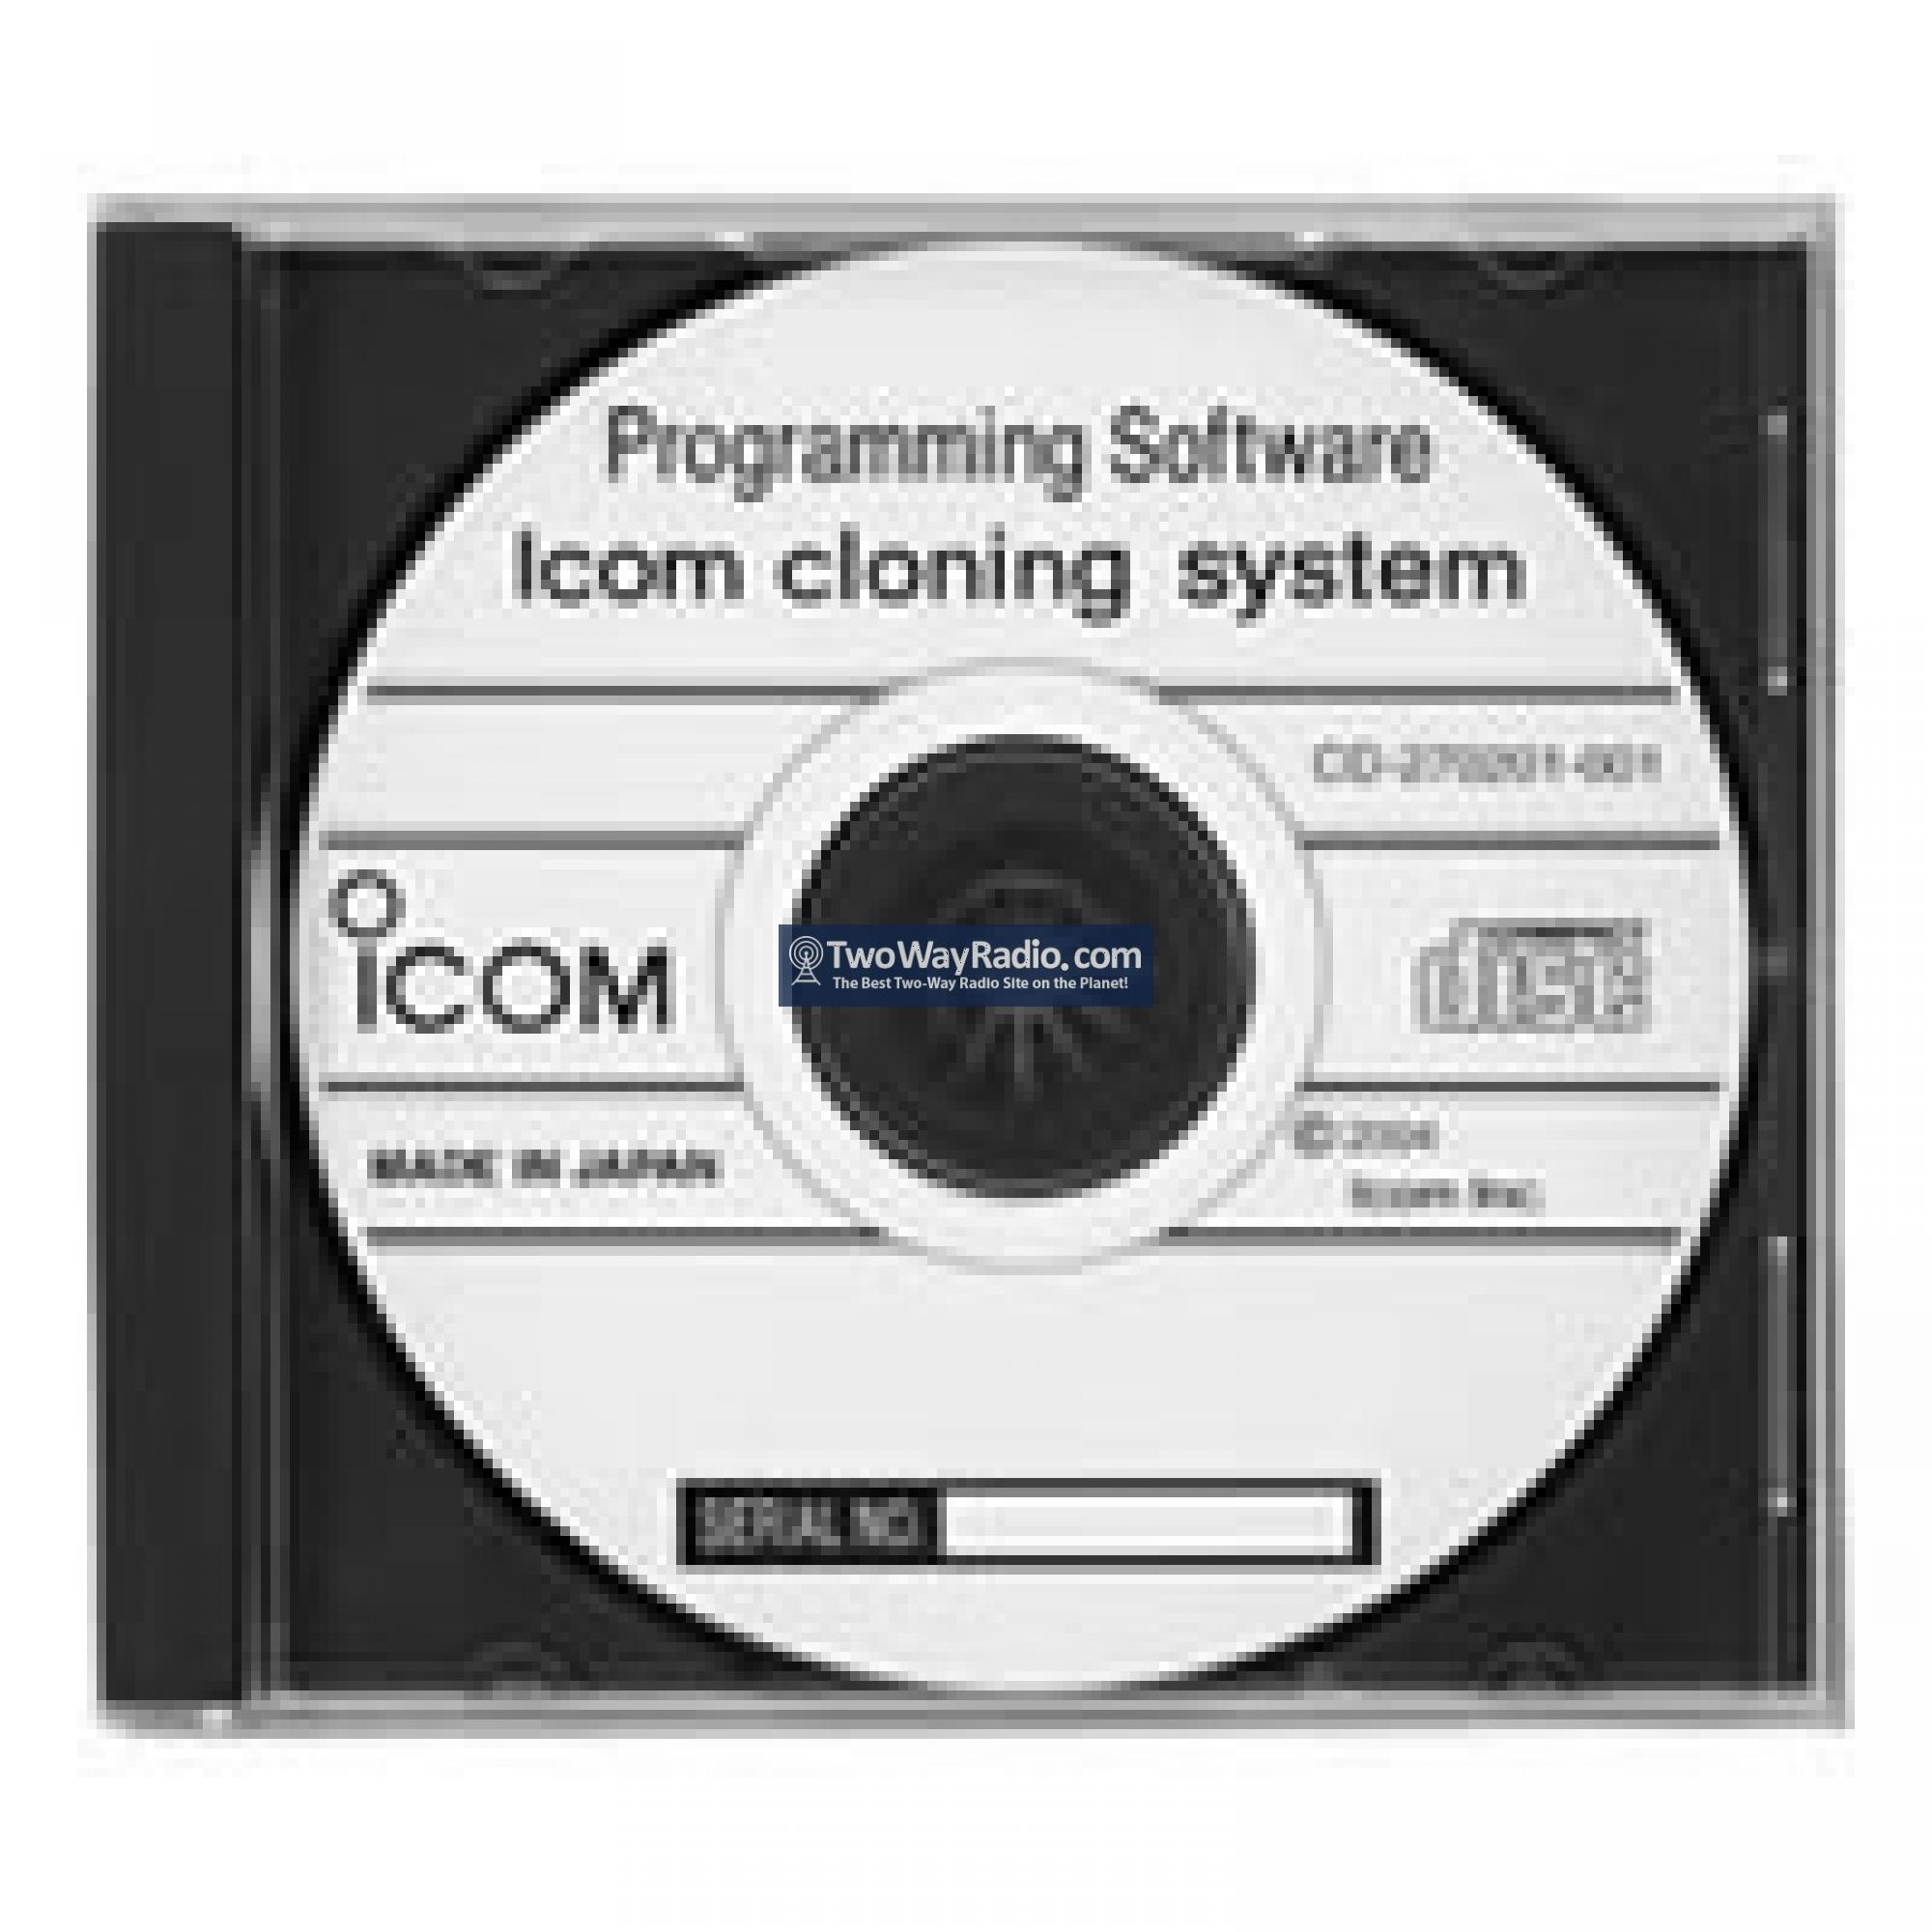 Buy Here | Icom CS-FR9010 Programming Software for the